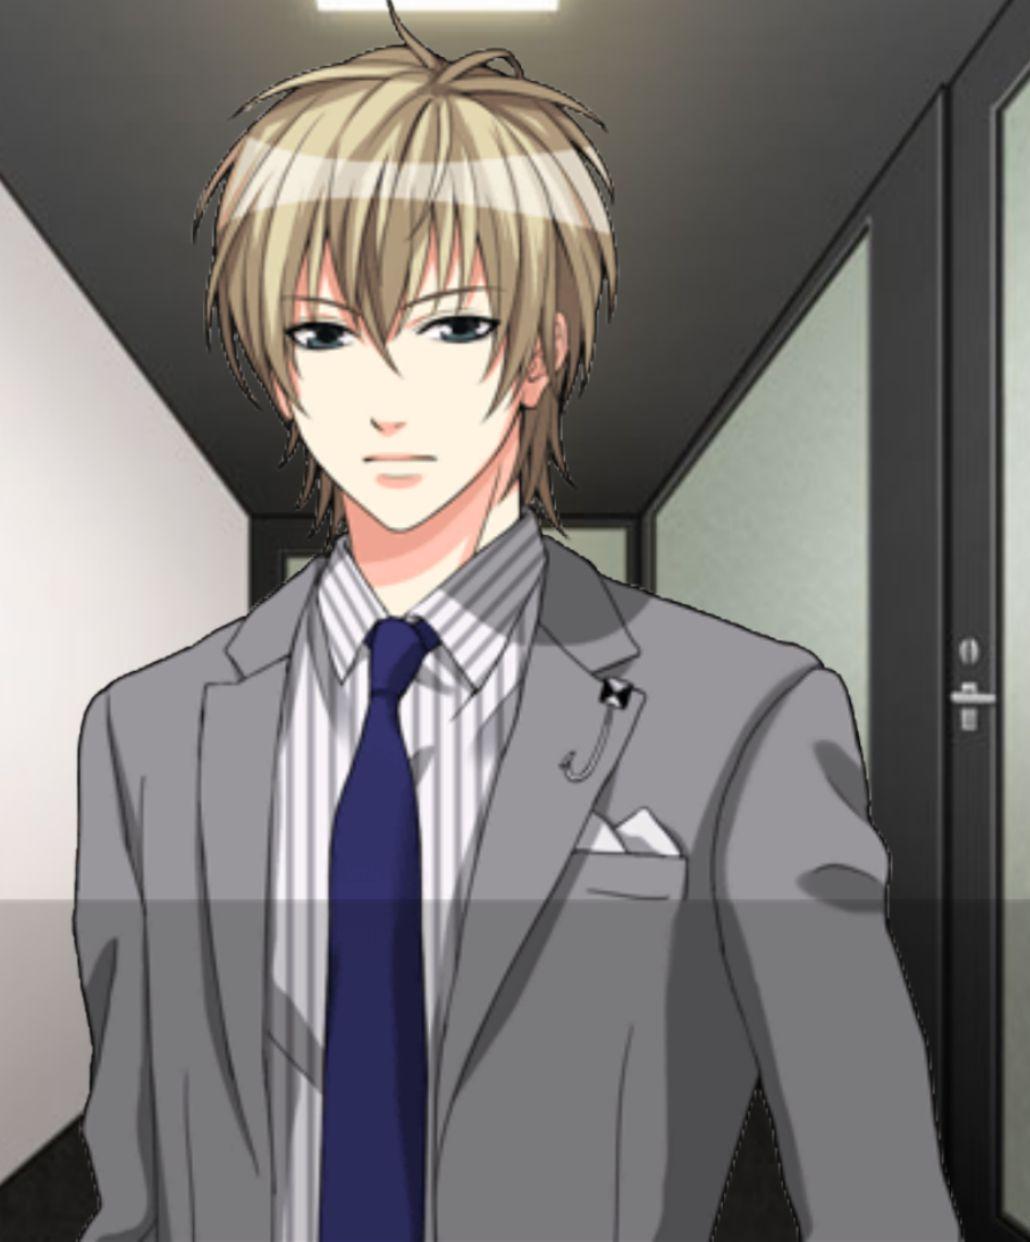 Ren Shibasaki (My Wedding And 7 Rings)